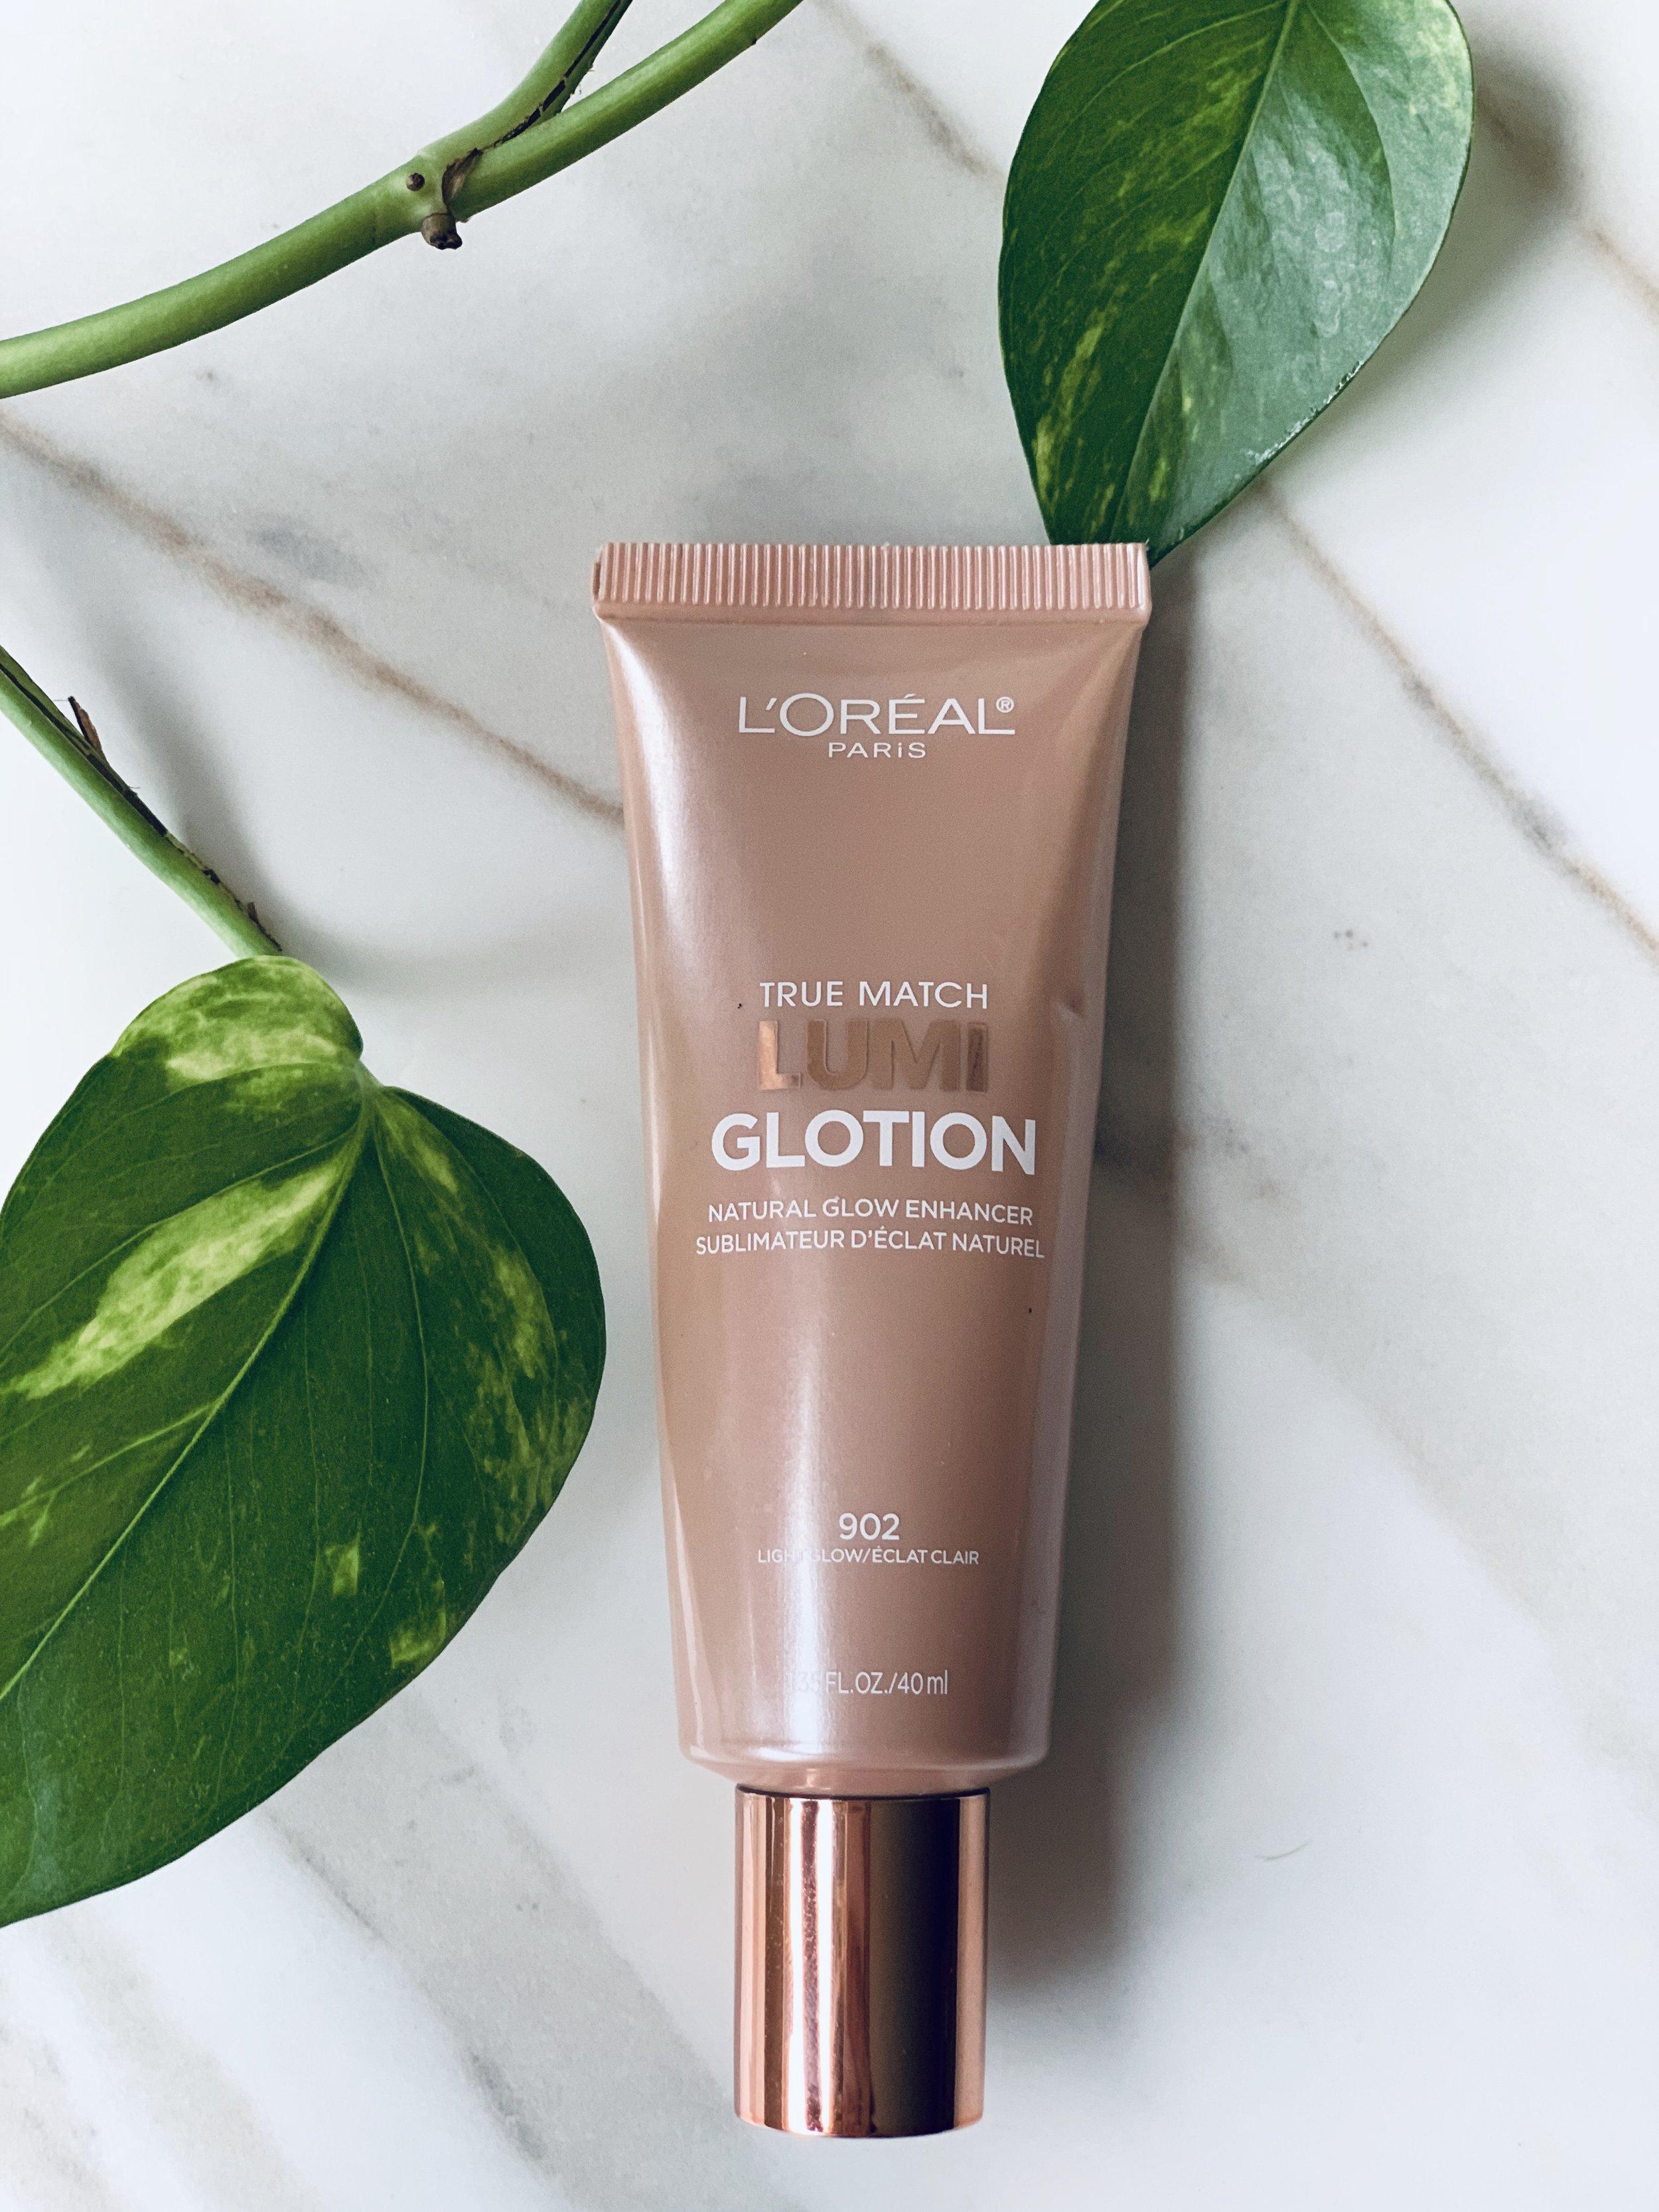 LOREAL - True Match LUMI Glotion